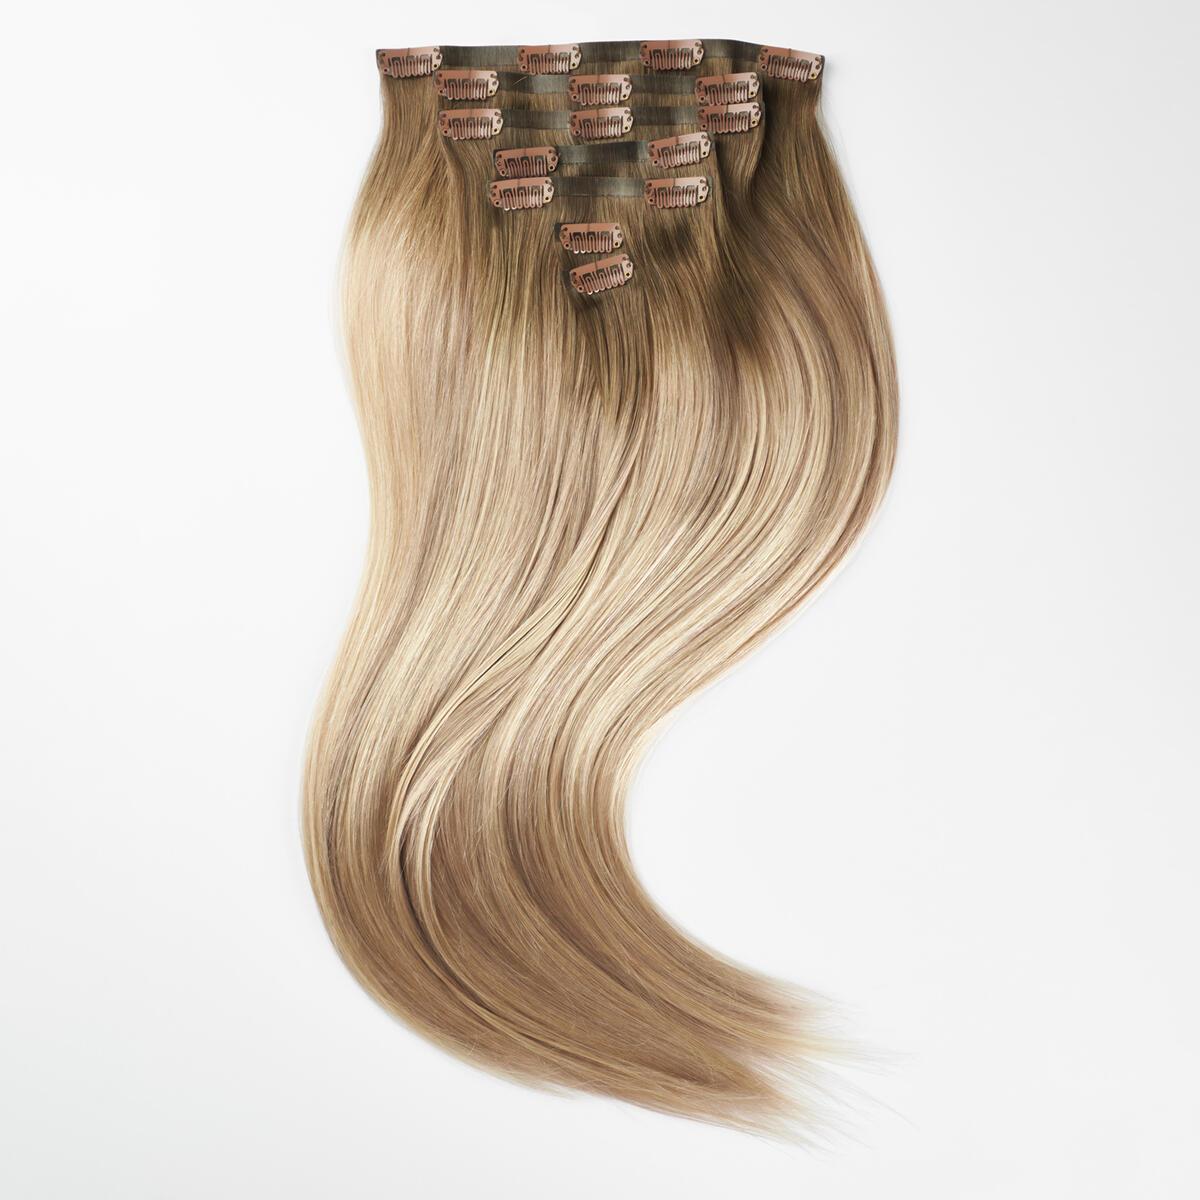 Sleek Clip-on set 7 pieces B2.6/10.7 Dark Ashy Blonde Balayage 50 cm